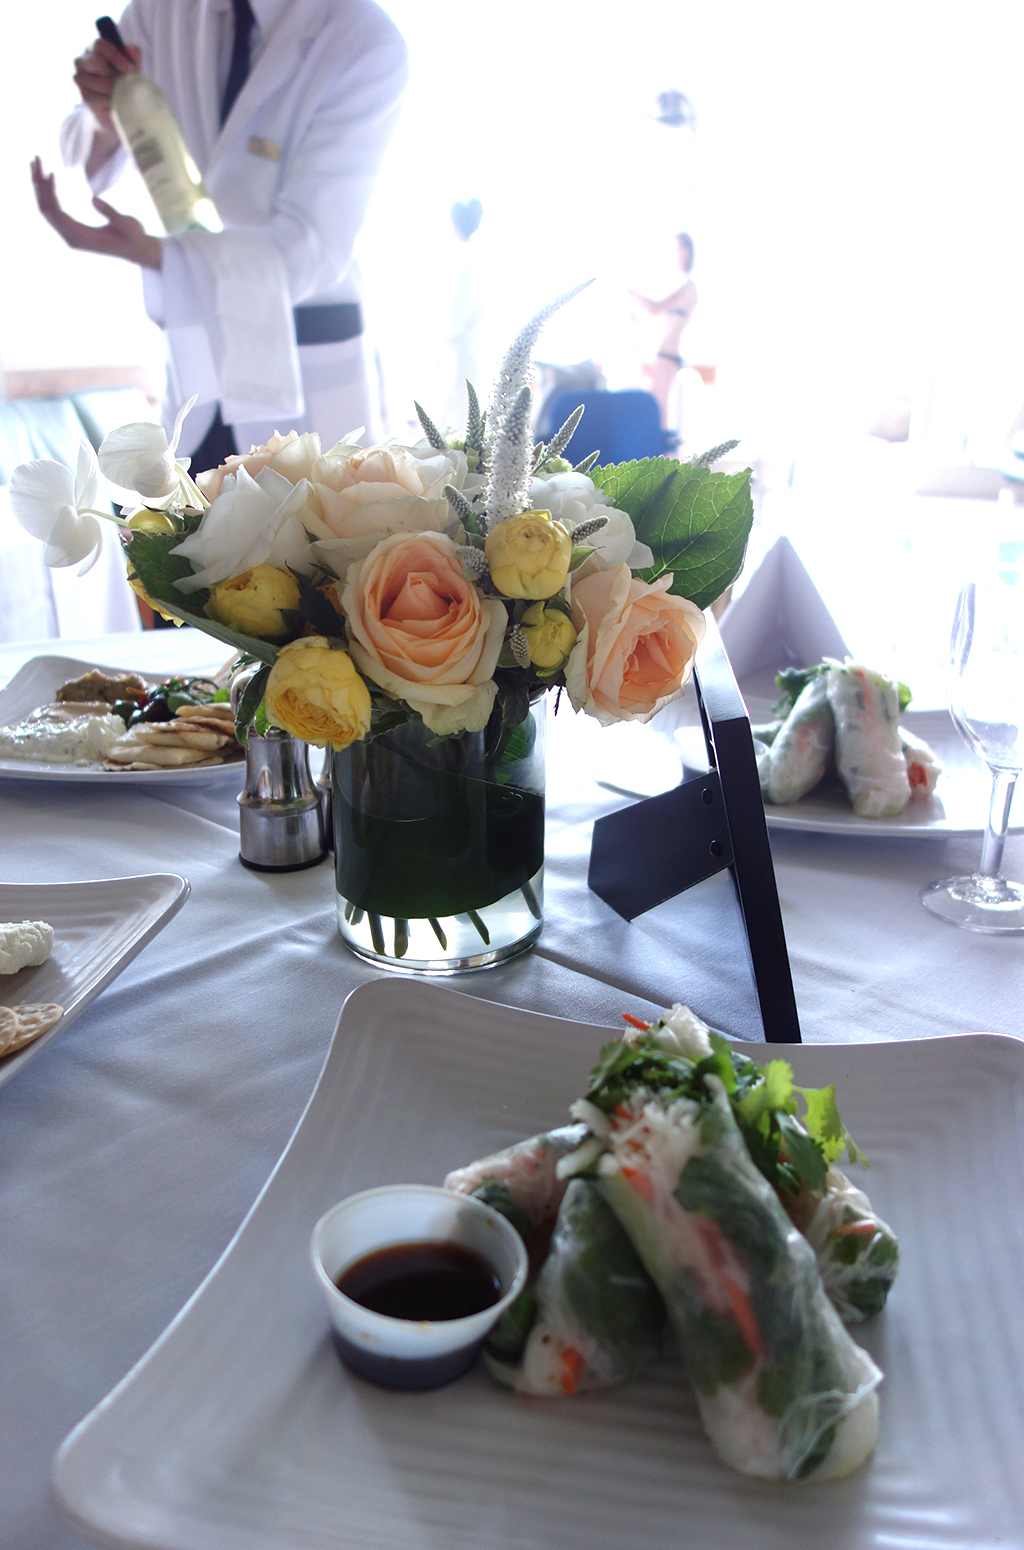 Poolside dining at Nob Hill Spa